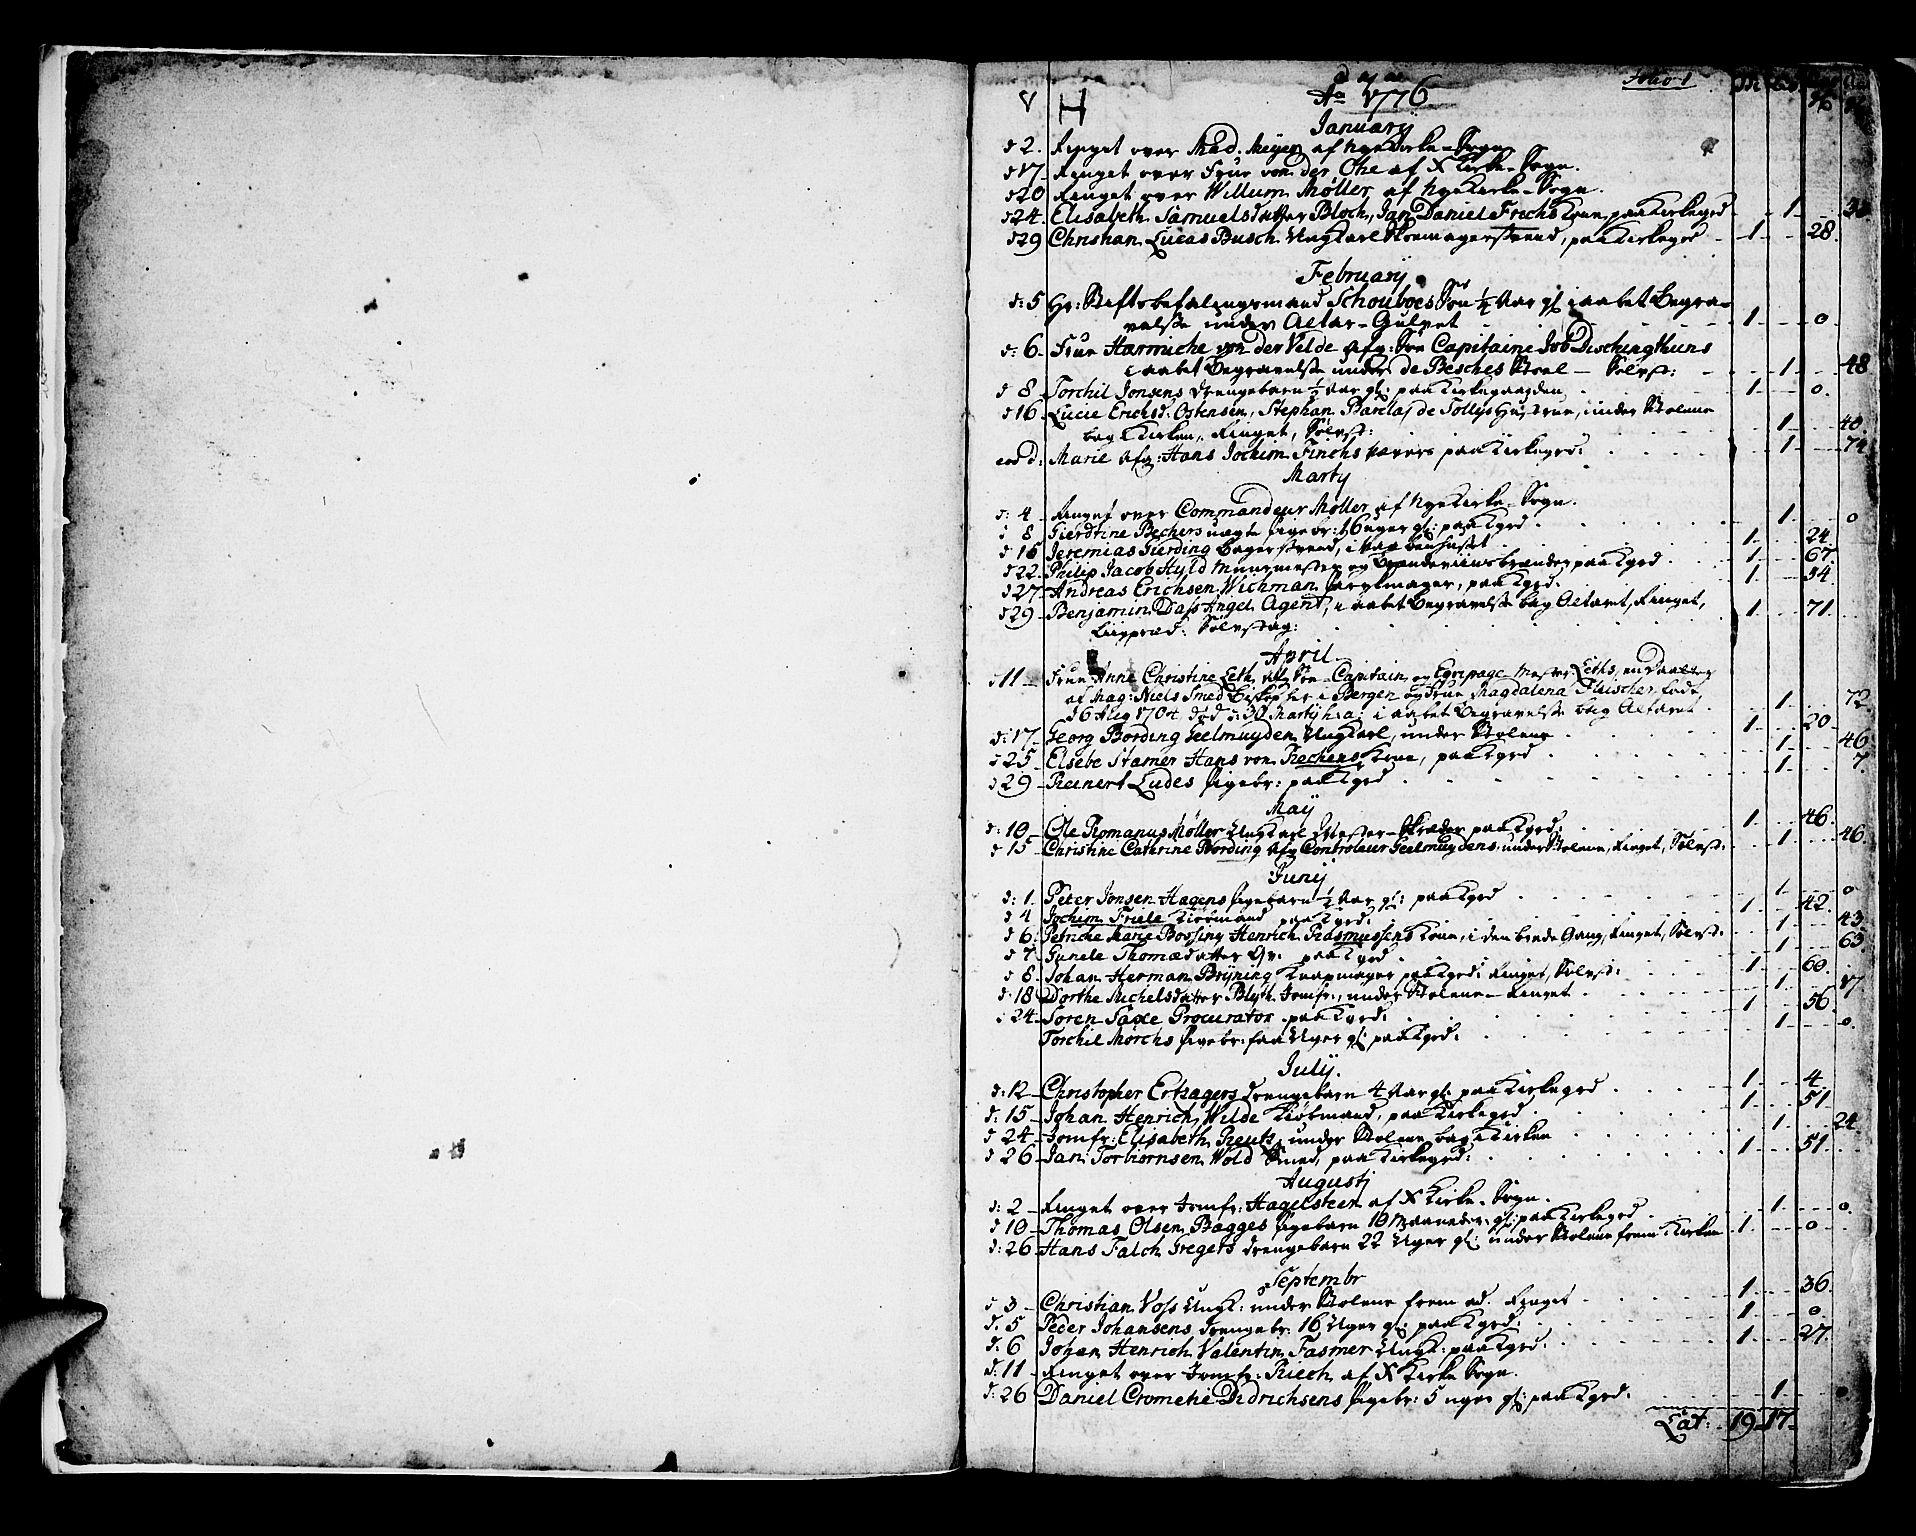 SAB, Domkirken sokneprestembete, H/Haa/L0009: Ministerialbok nr. A 9, 1776-1821, s. 1